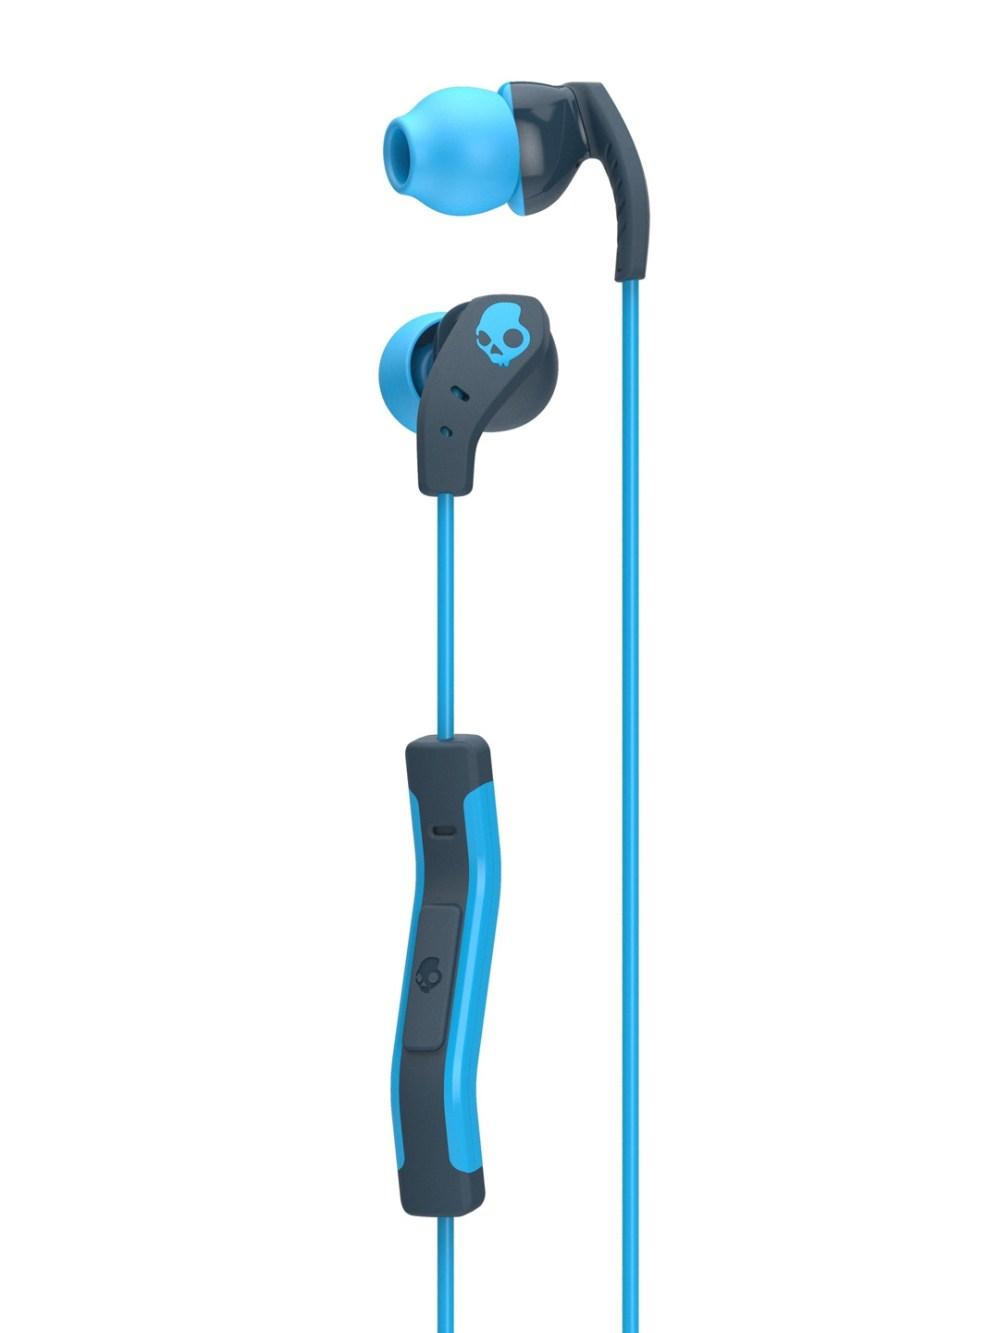 medium resolution of buy skullcandy blue black method wired in ear earphones with mic s2cdy k477 headphones for unisex 1927902 myntra